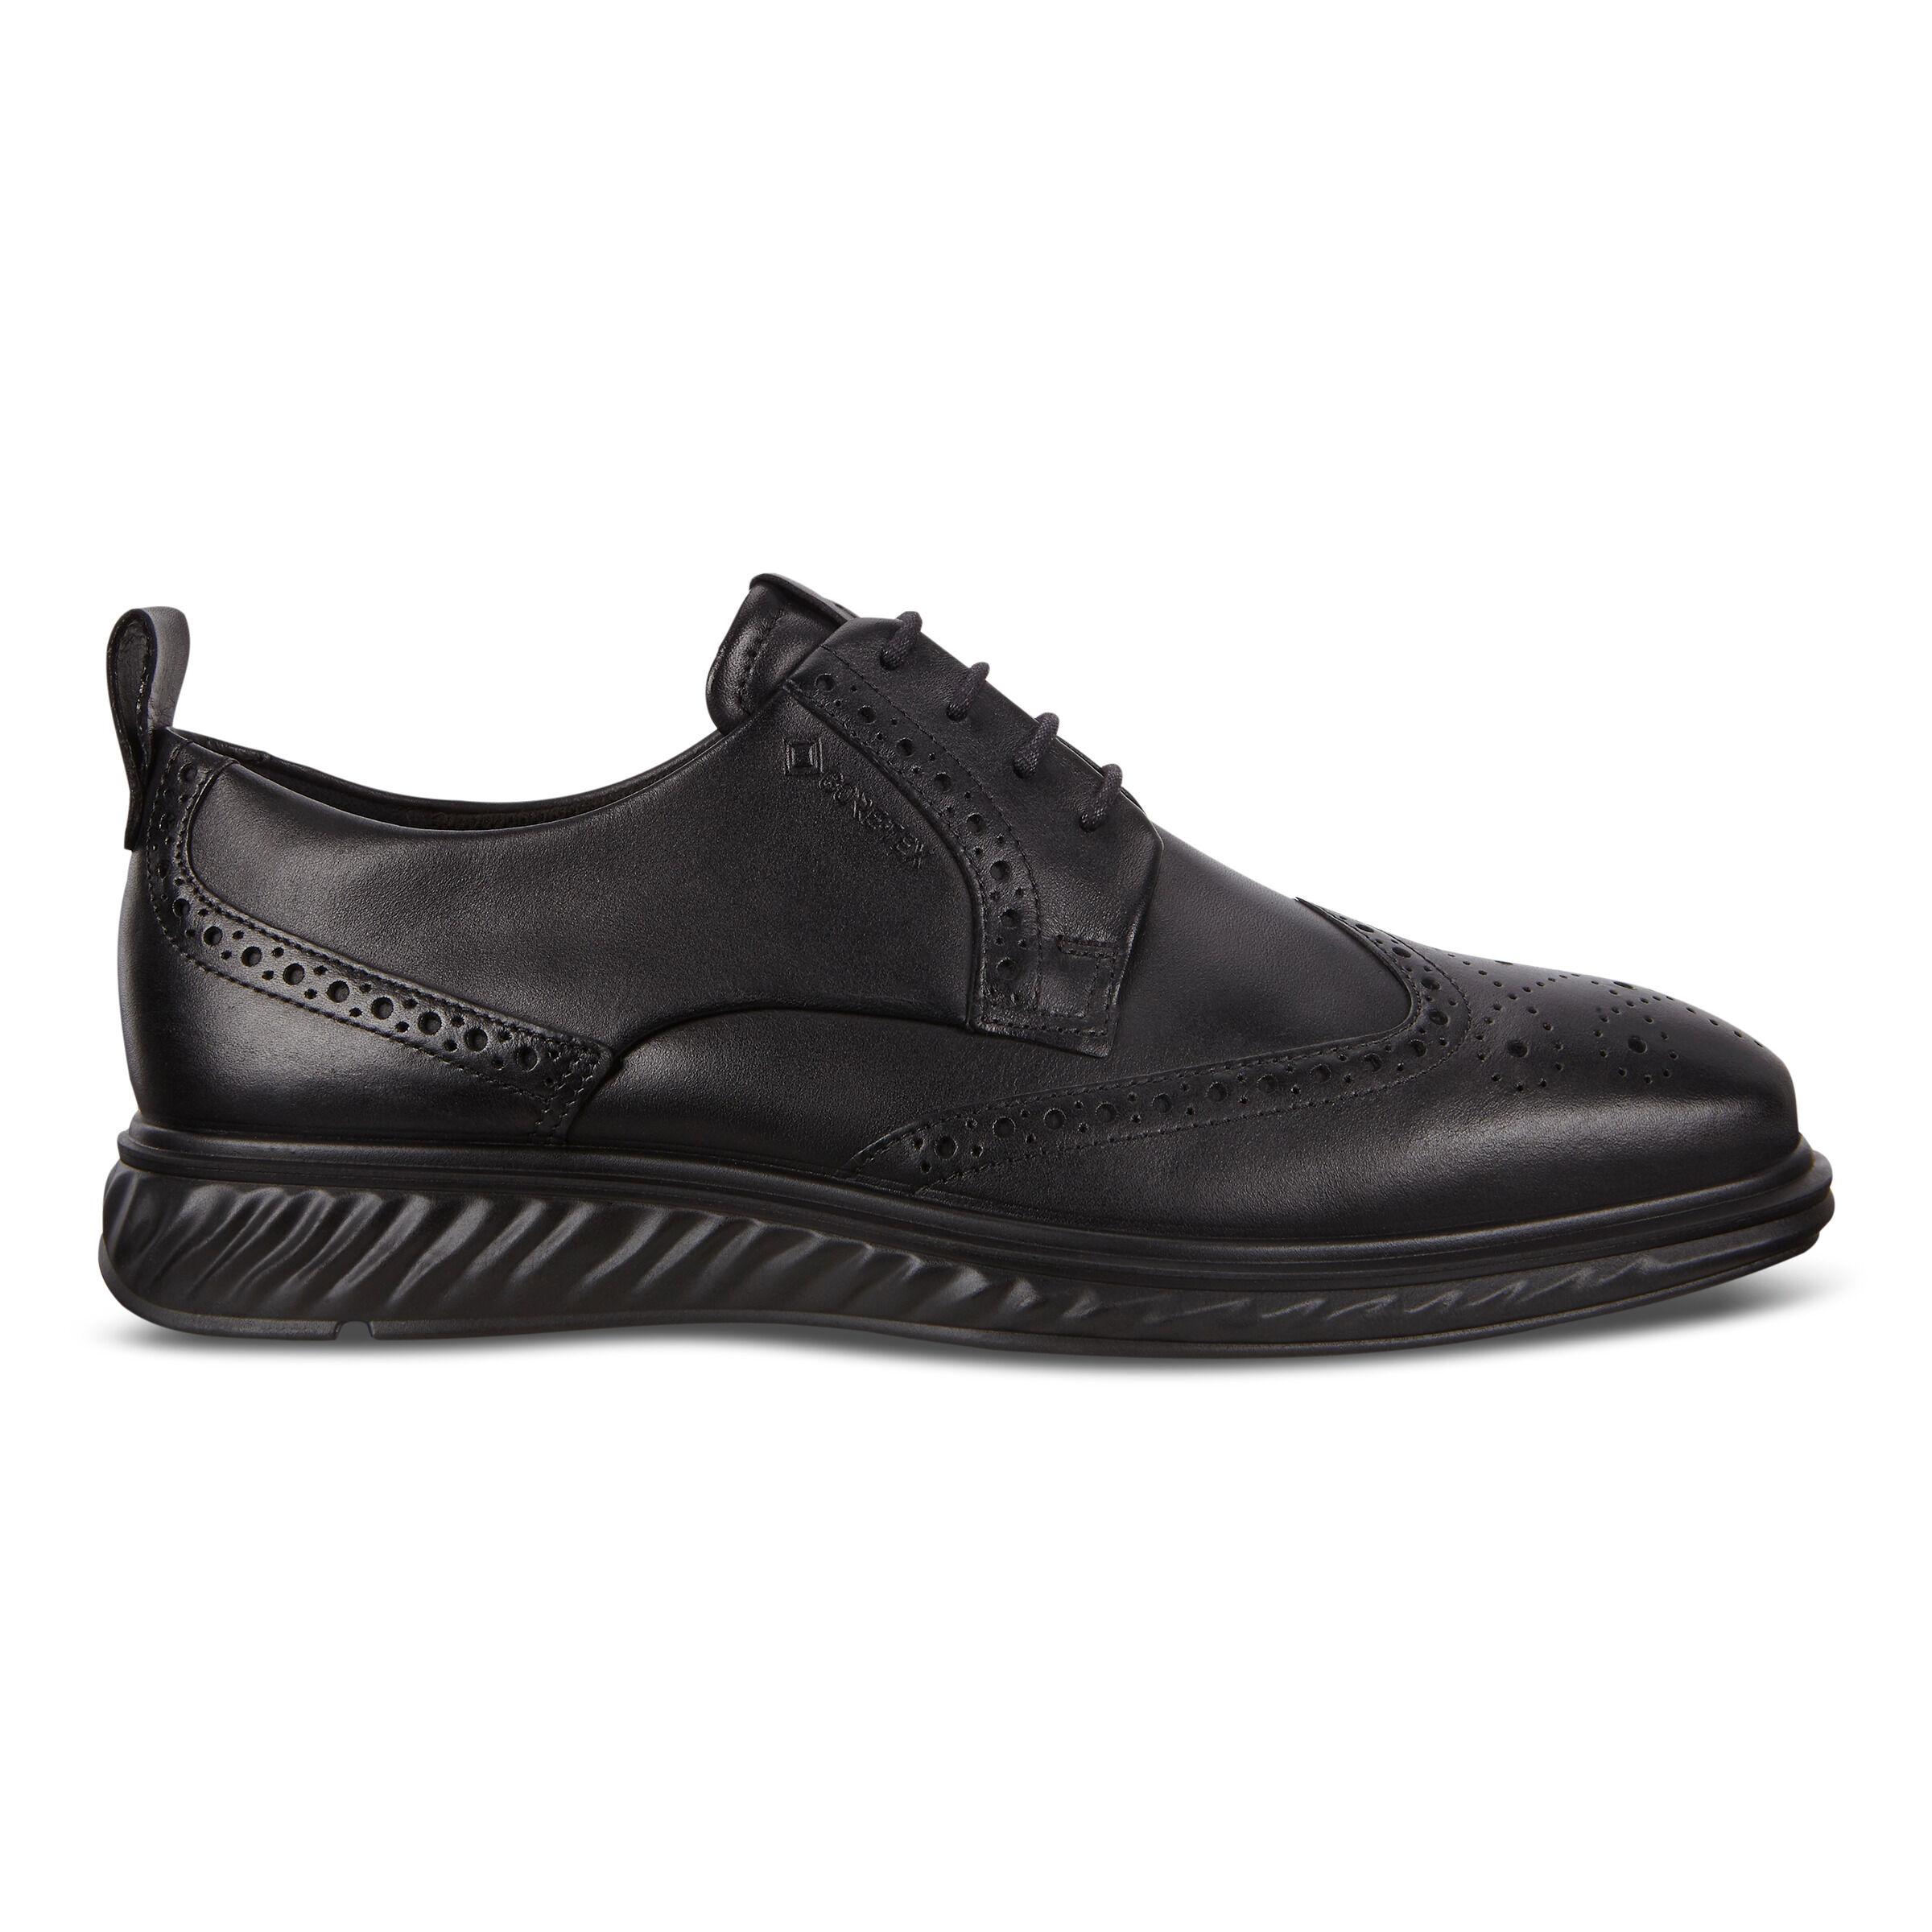 ECCO ST.1 Mens Hybrid Lite Wingtip Shoes: 7 - Black